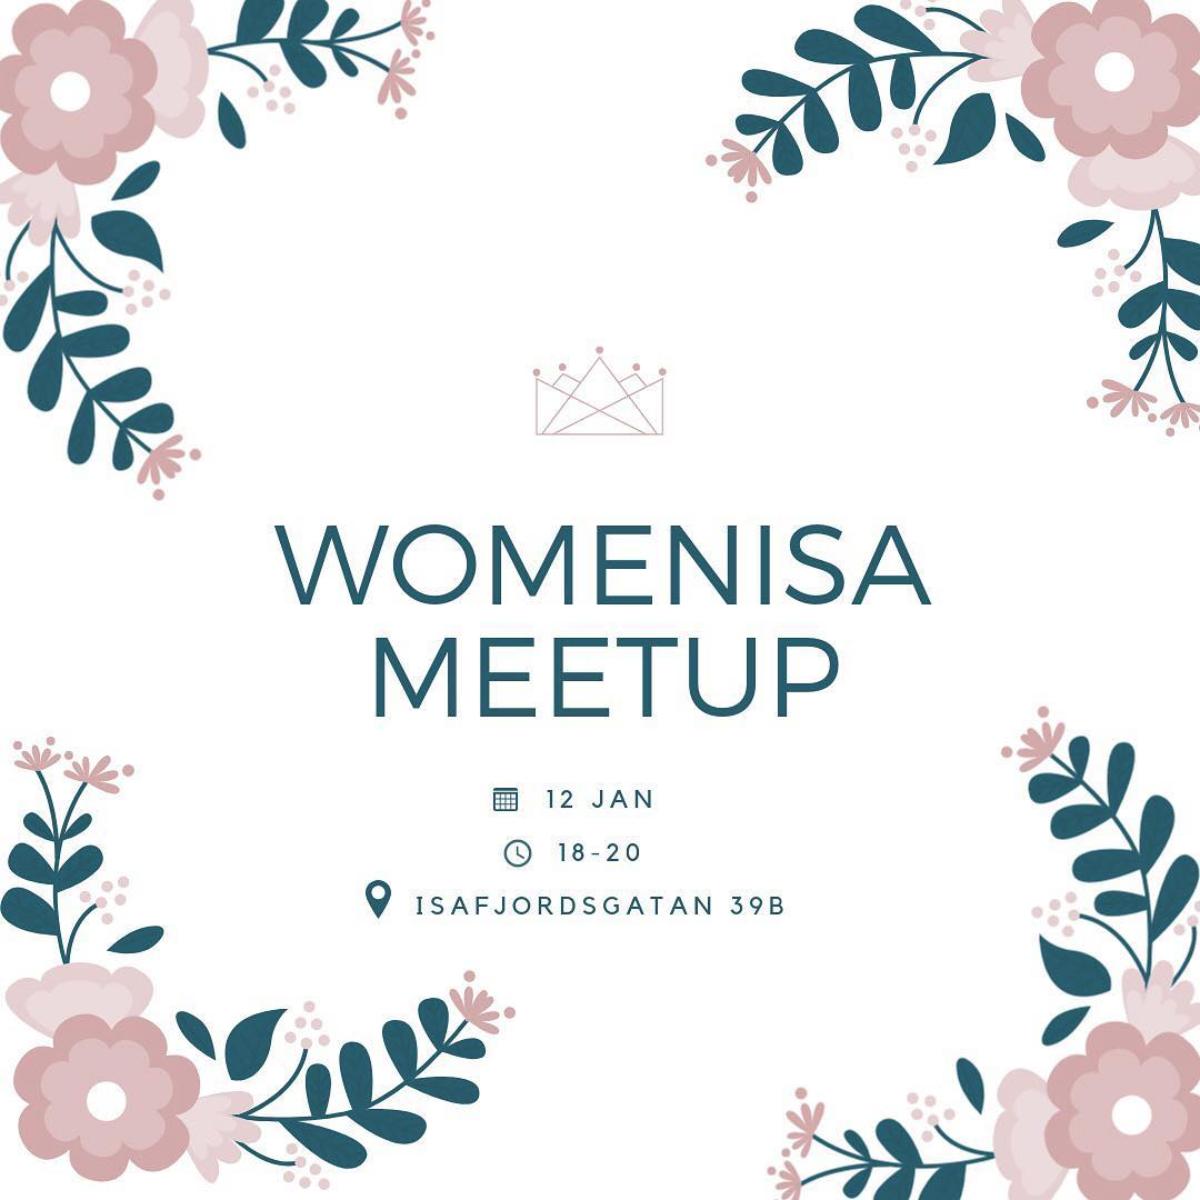 Womenisa meetup